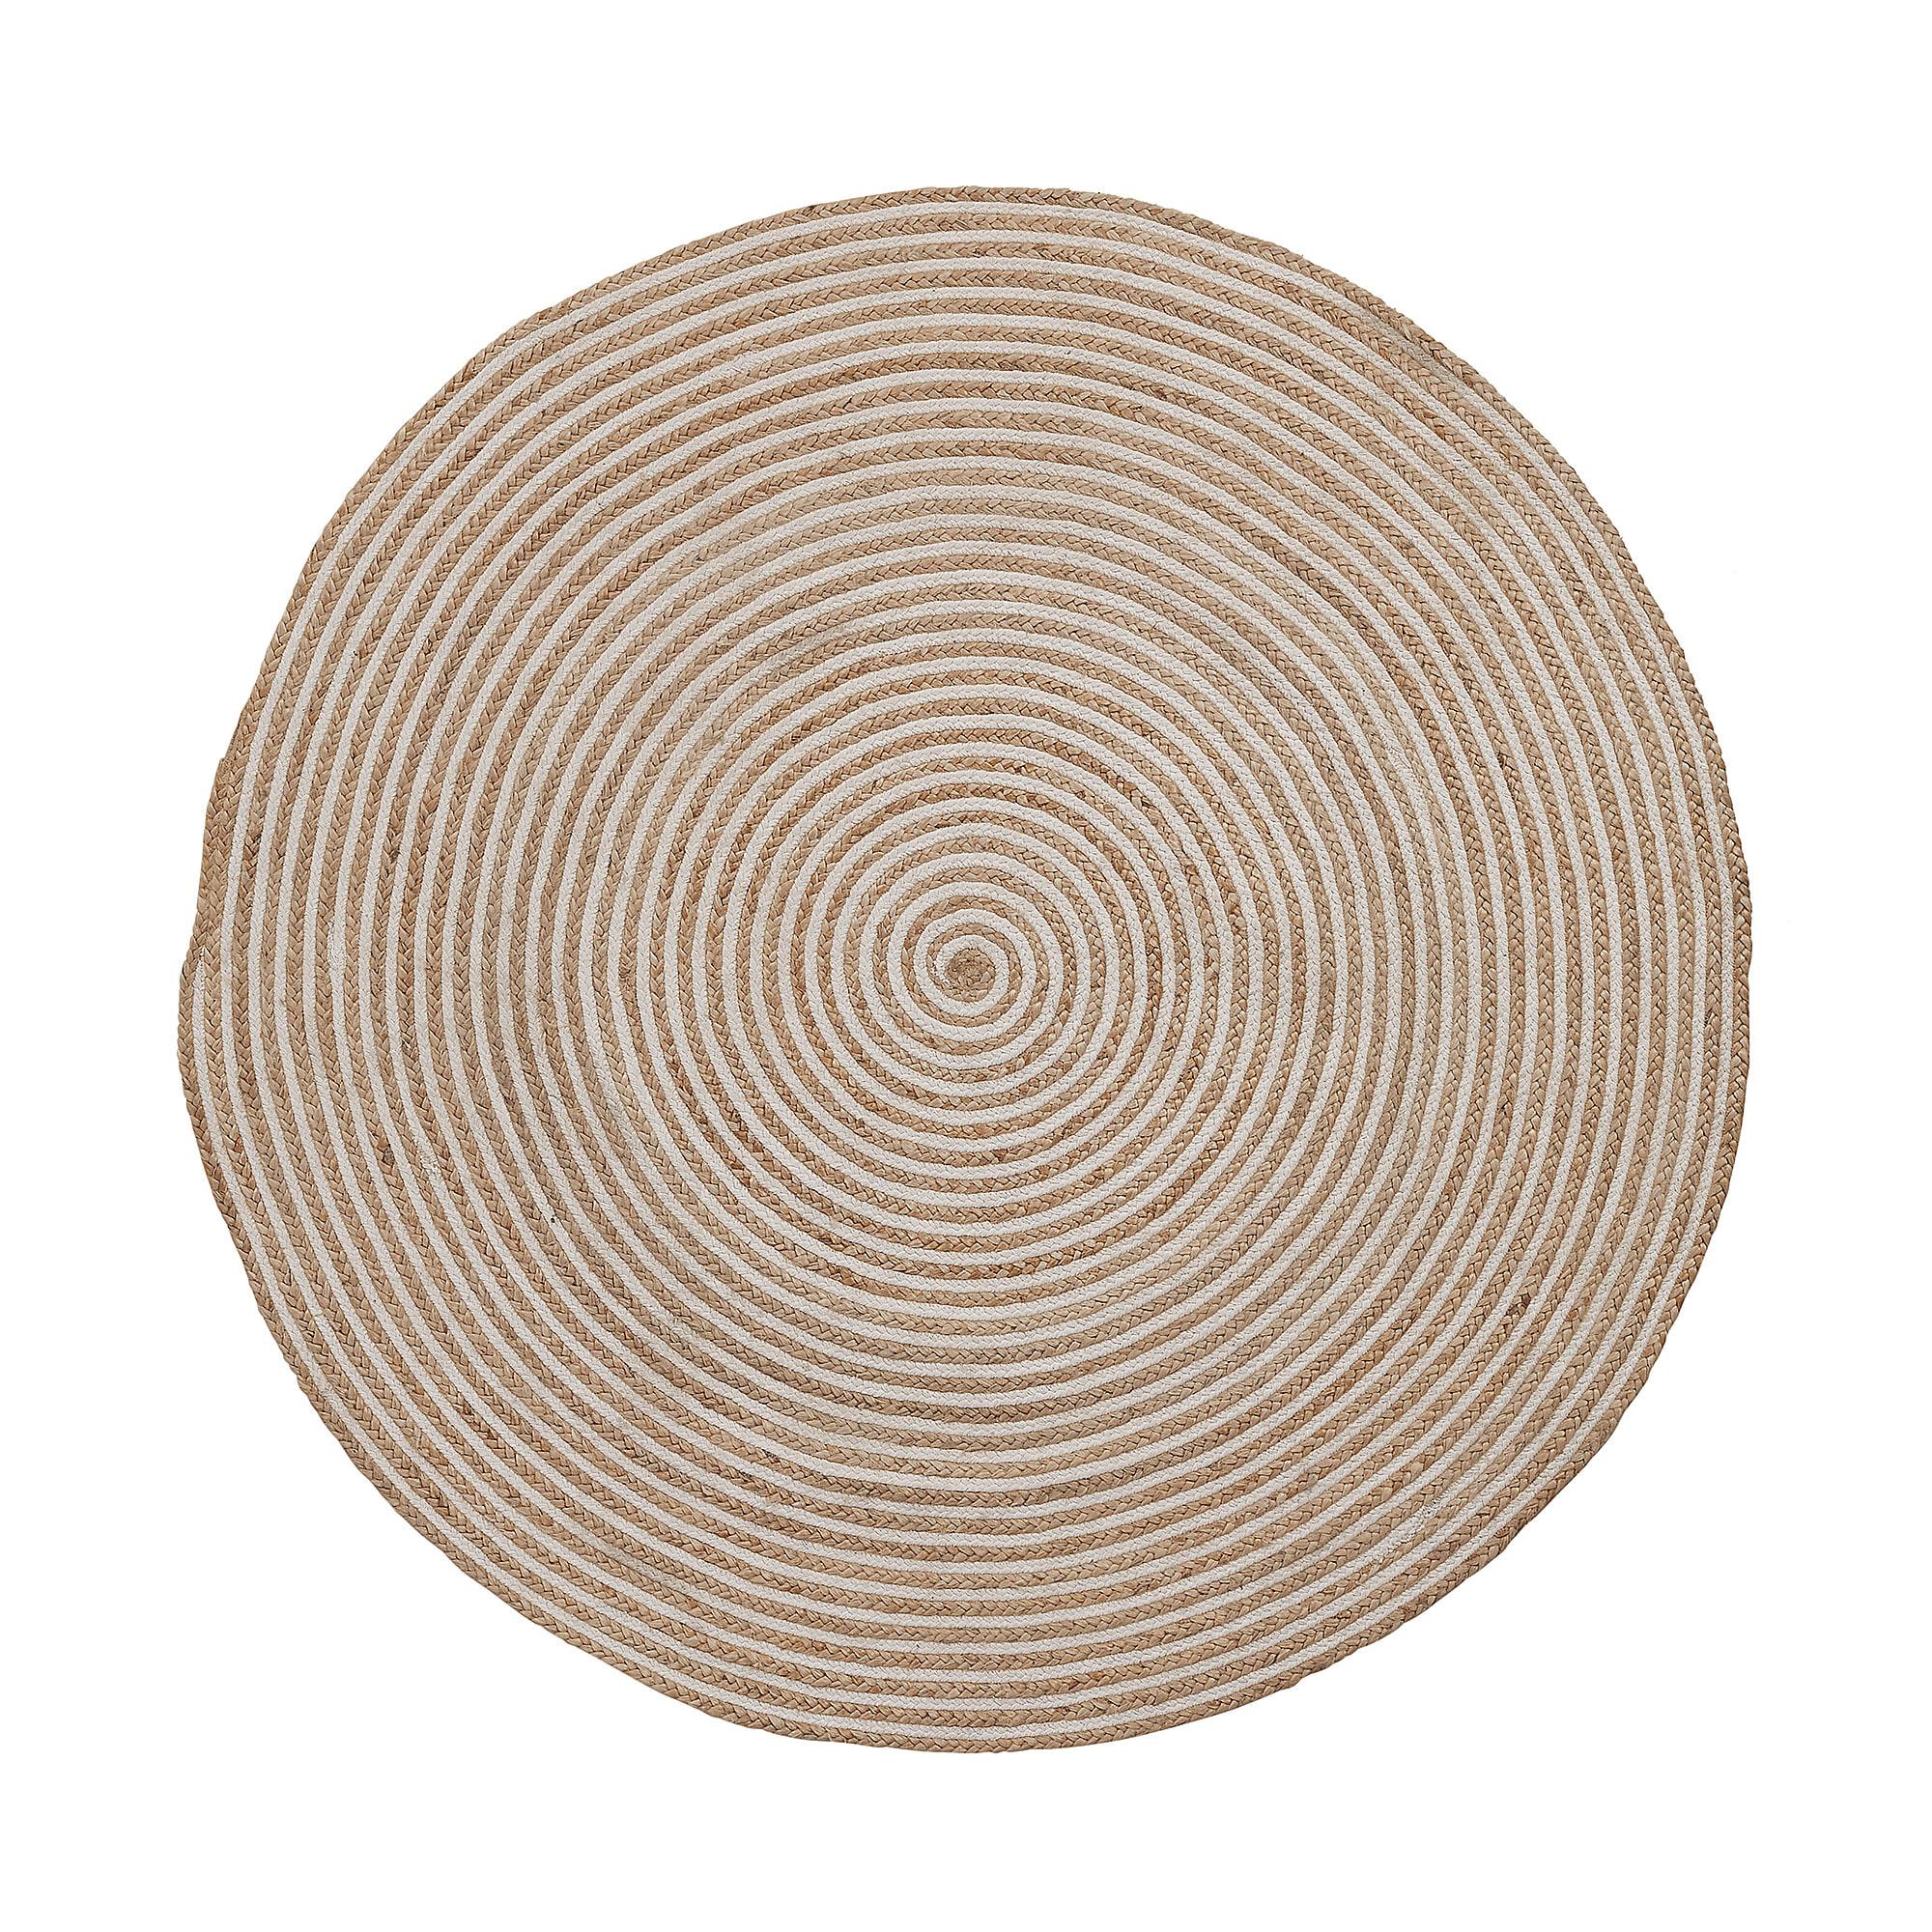 Kave Home Rond Vloerkleed 'Saht' 100cm, kleur Naturel/Wit